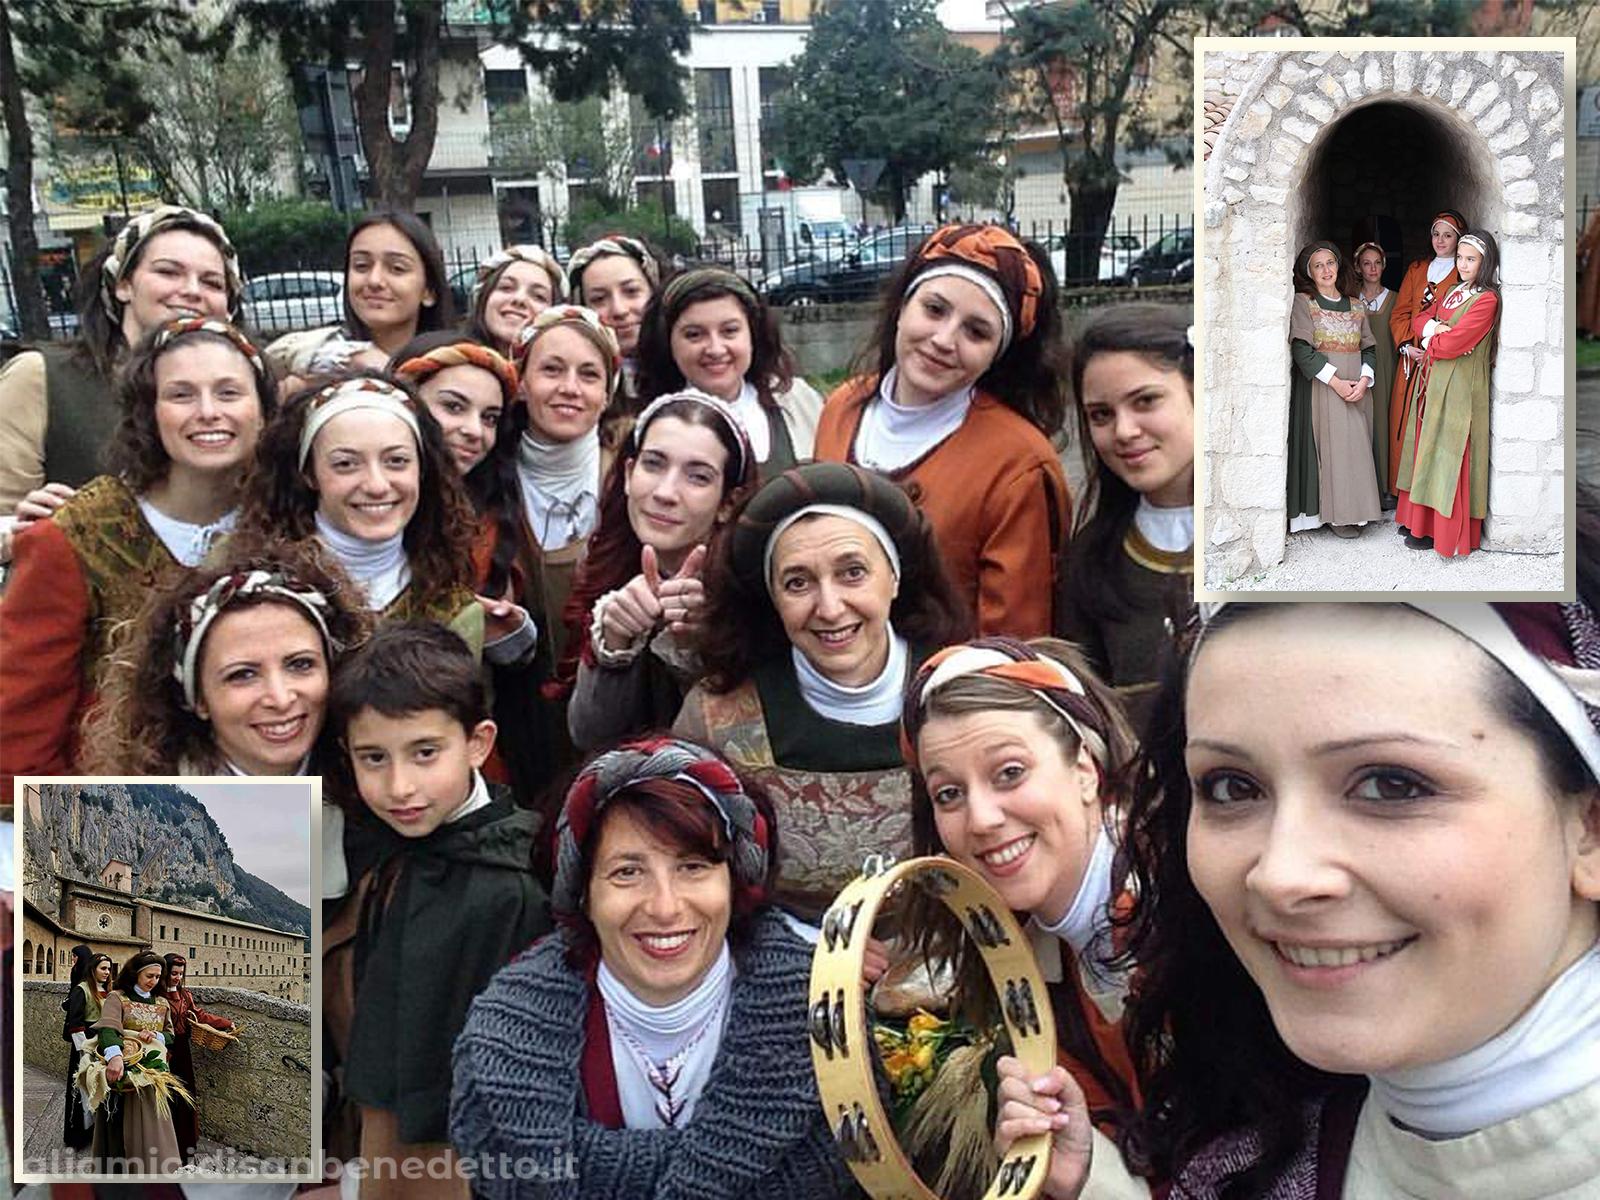 Le popolane del Corteo Storico Terra Sancti Benedicti